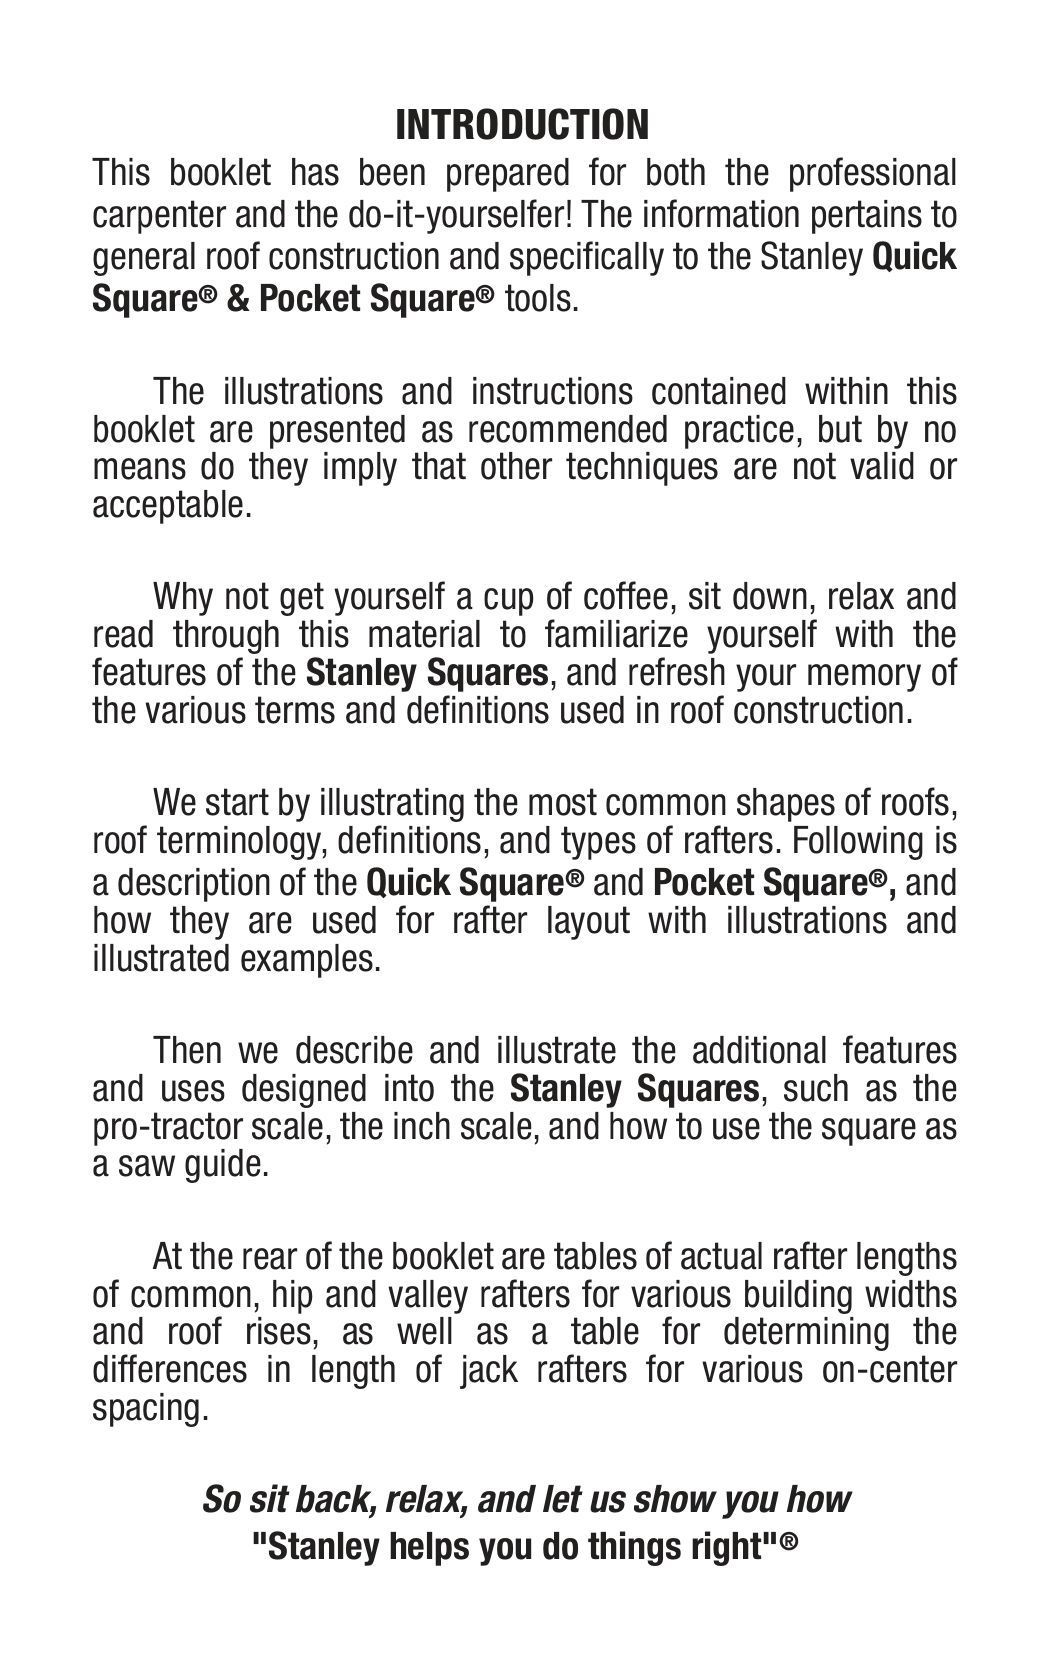 Quick Square Instruction Manual - Stanley-Quick Square Instruction Manual -  Stanley